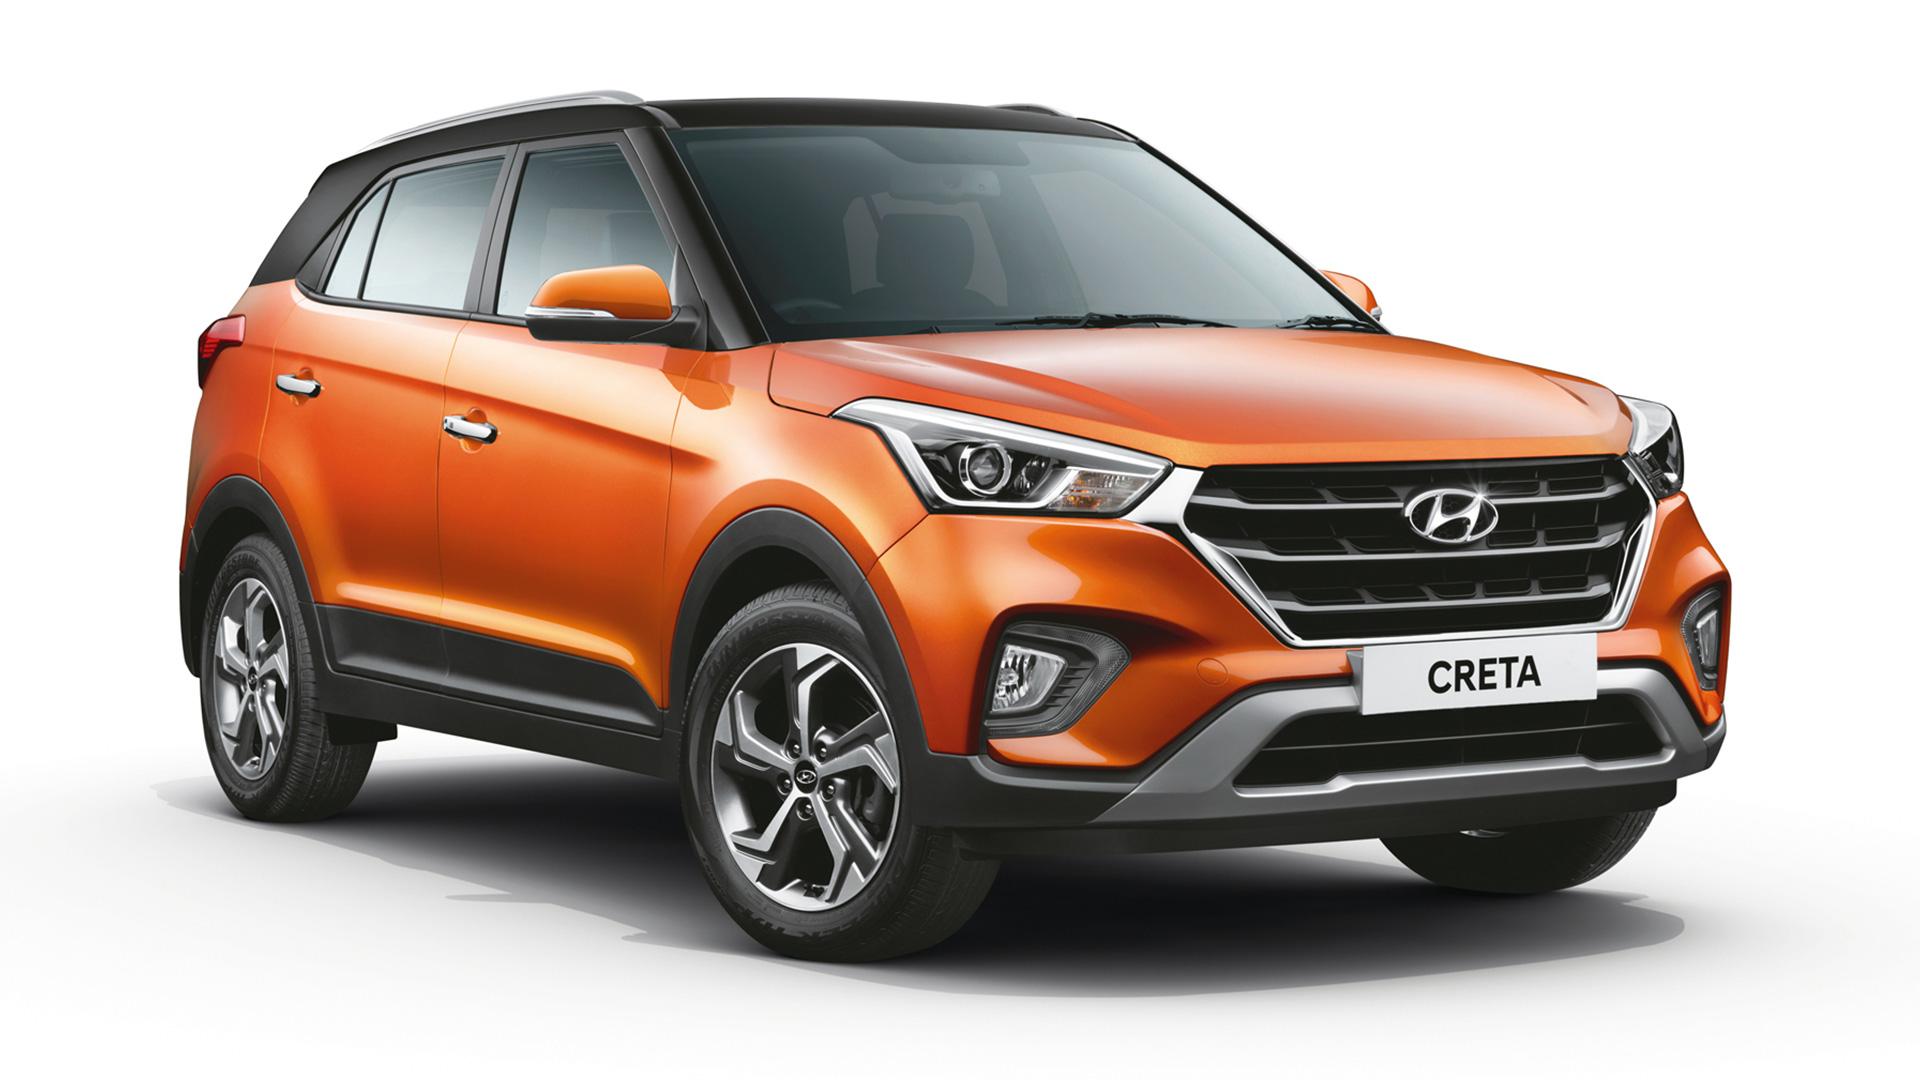 Hyundai Creta 2018 1.6 E+ petrol